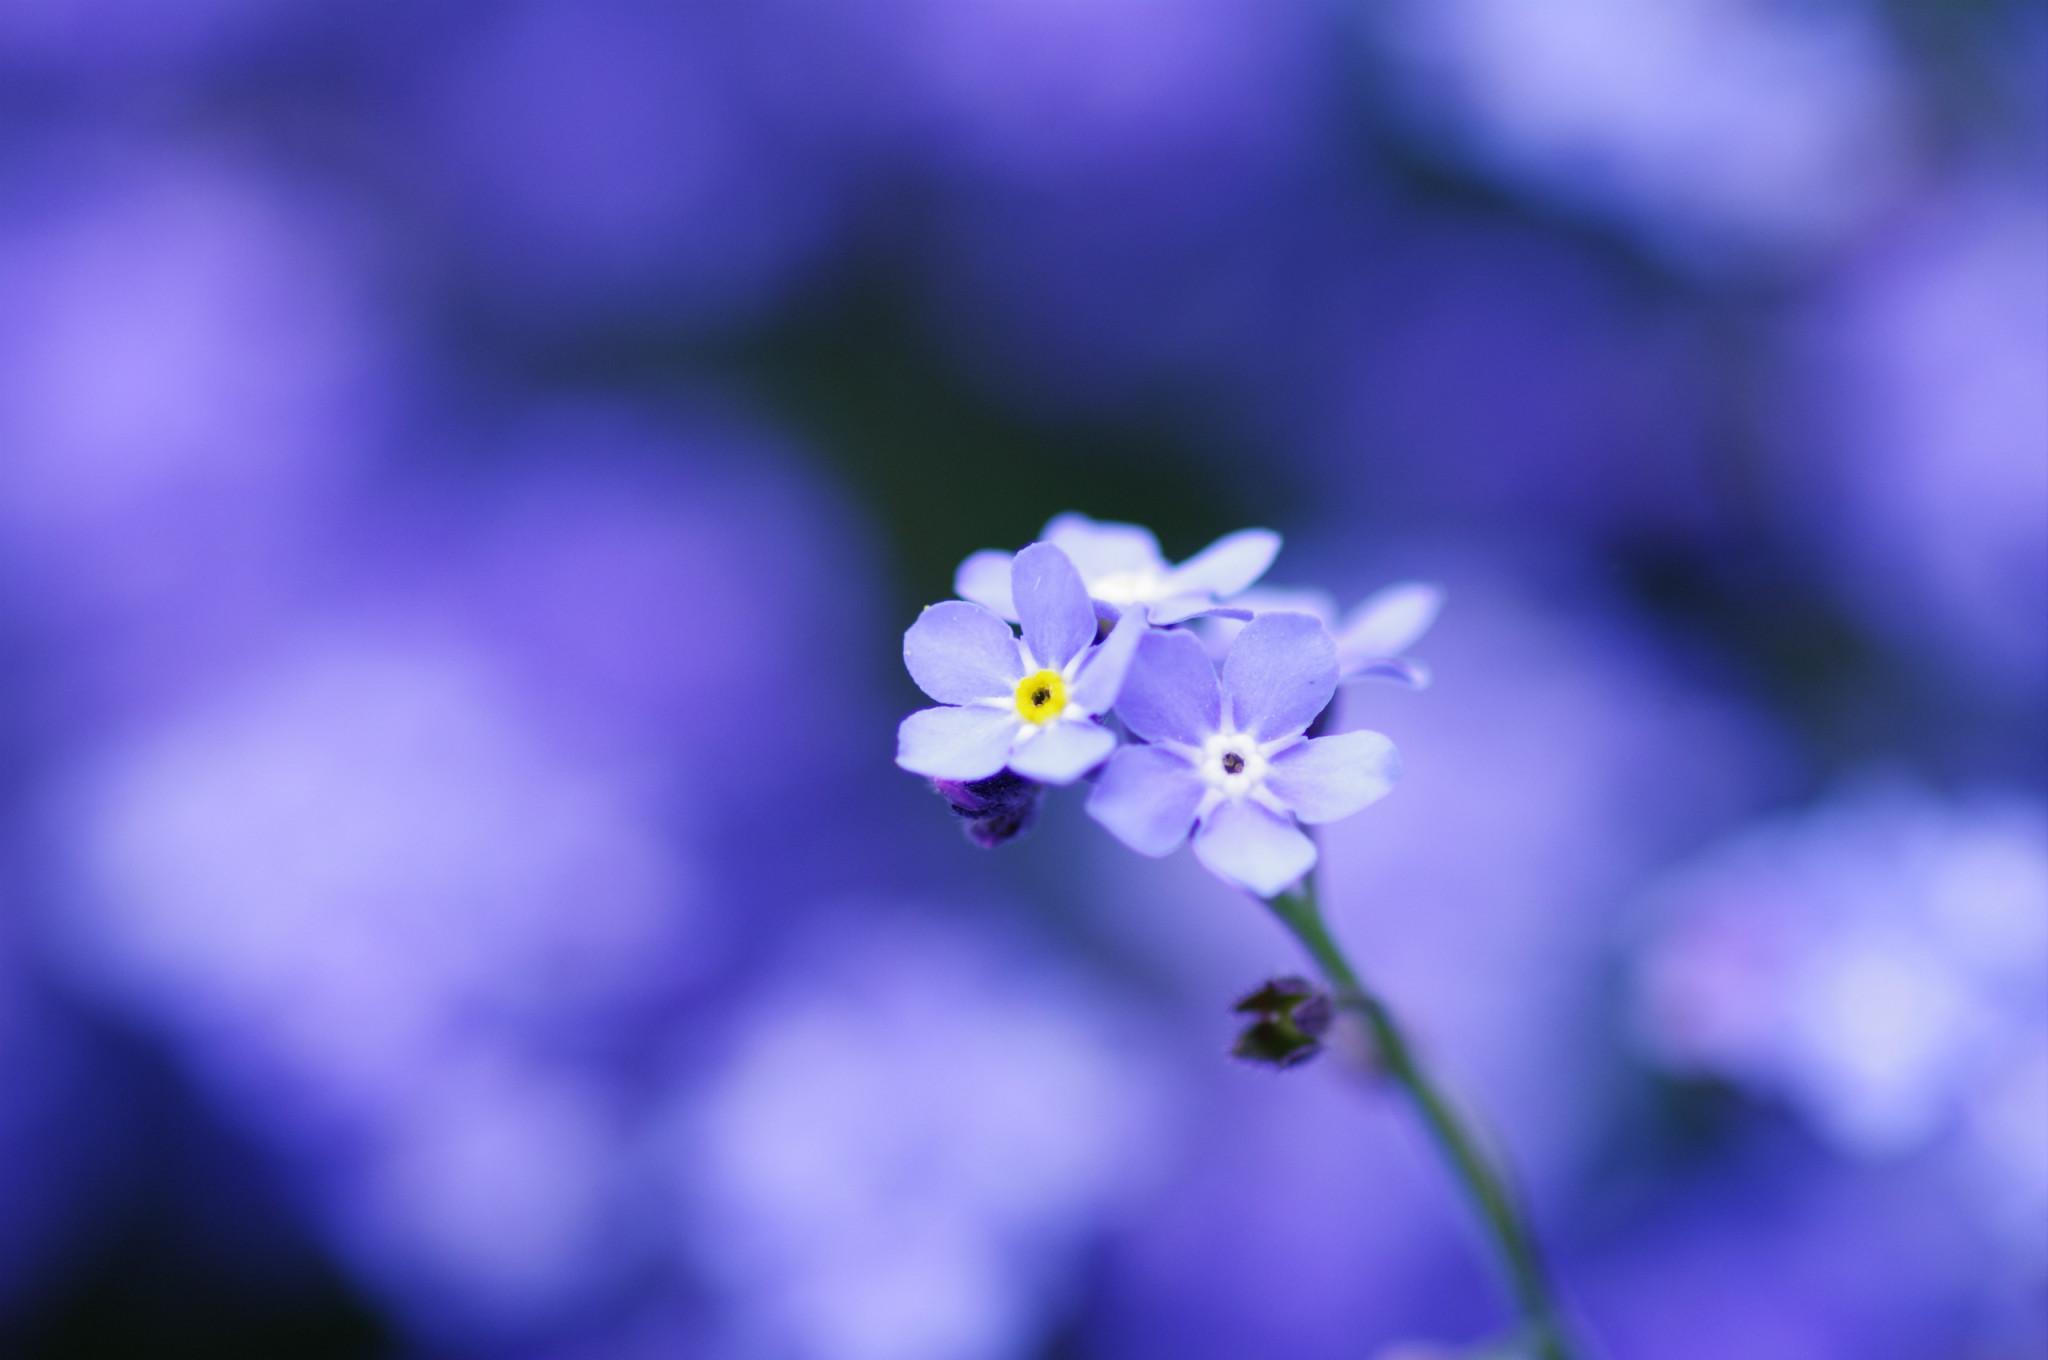 Xem ảnh hoa lưu ly